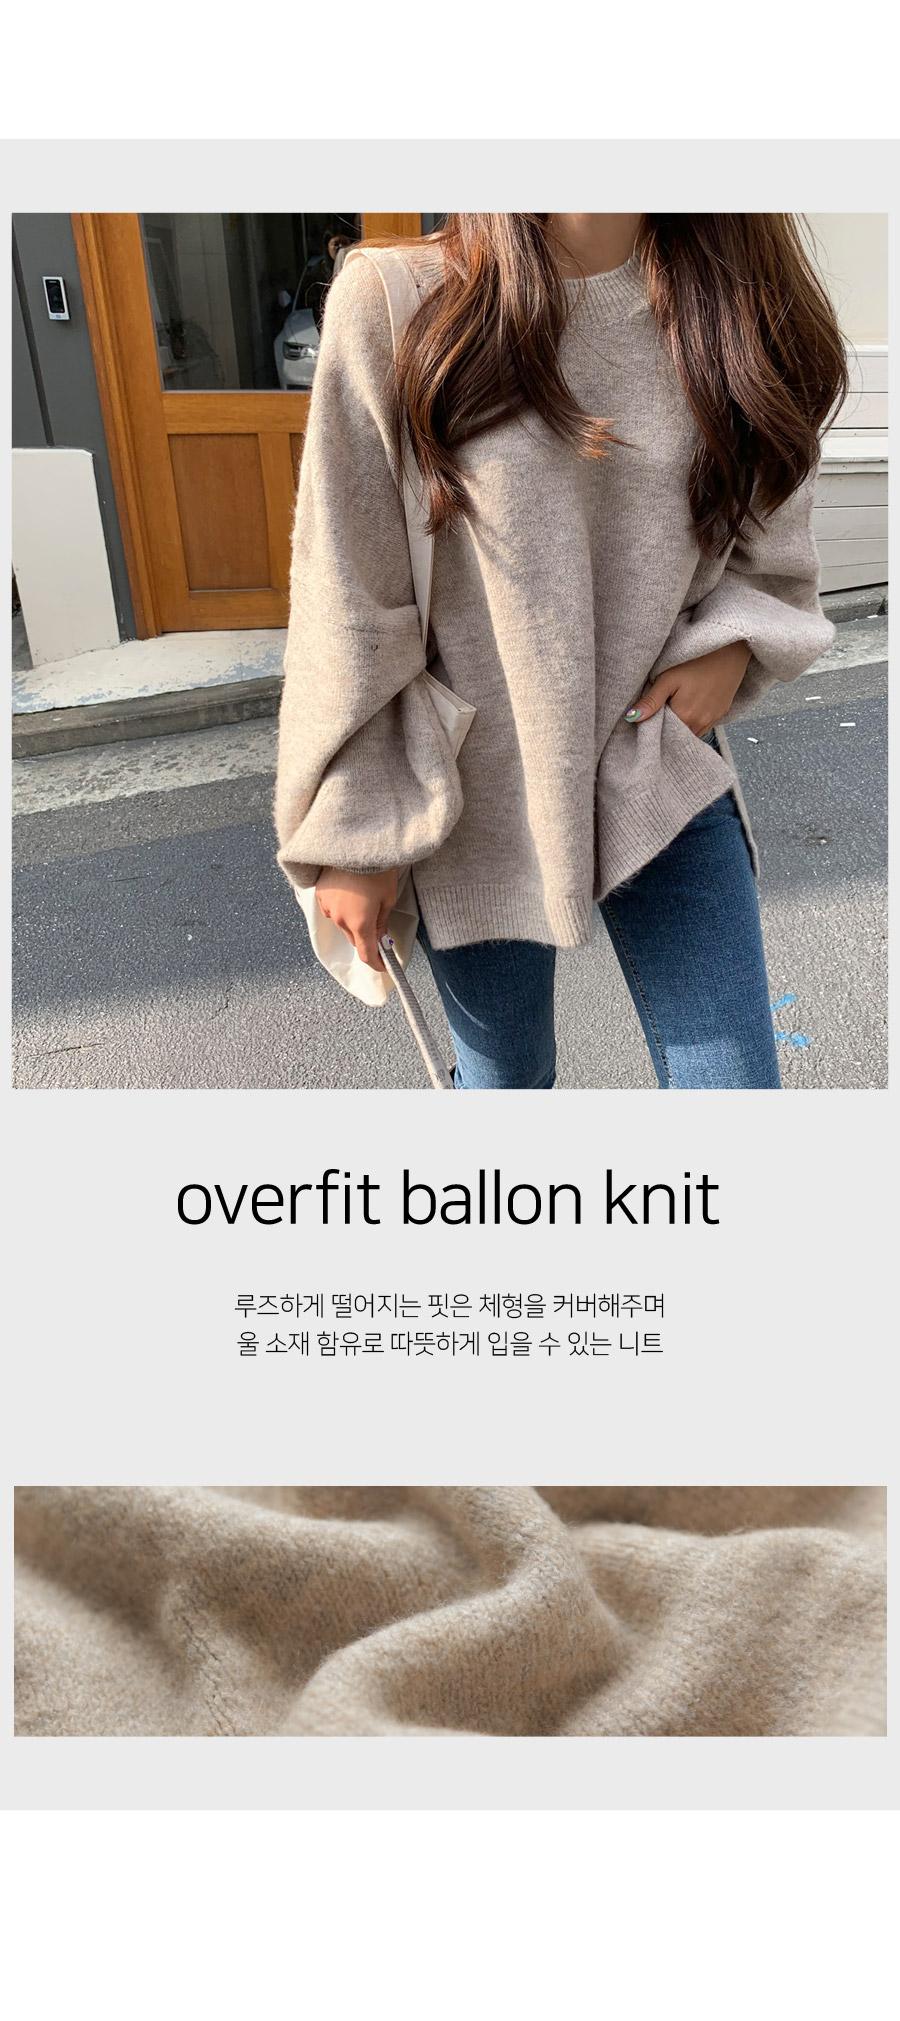 Cash Balloon Overfit Knit